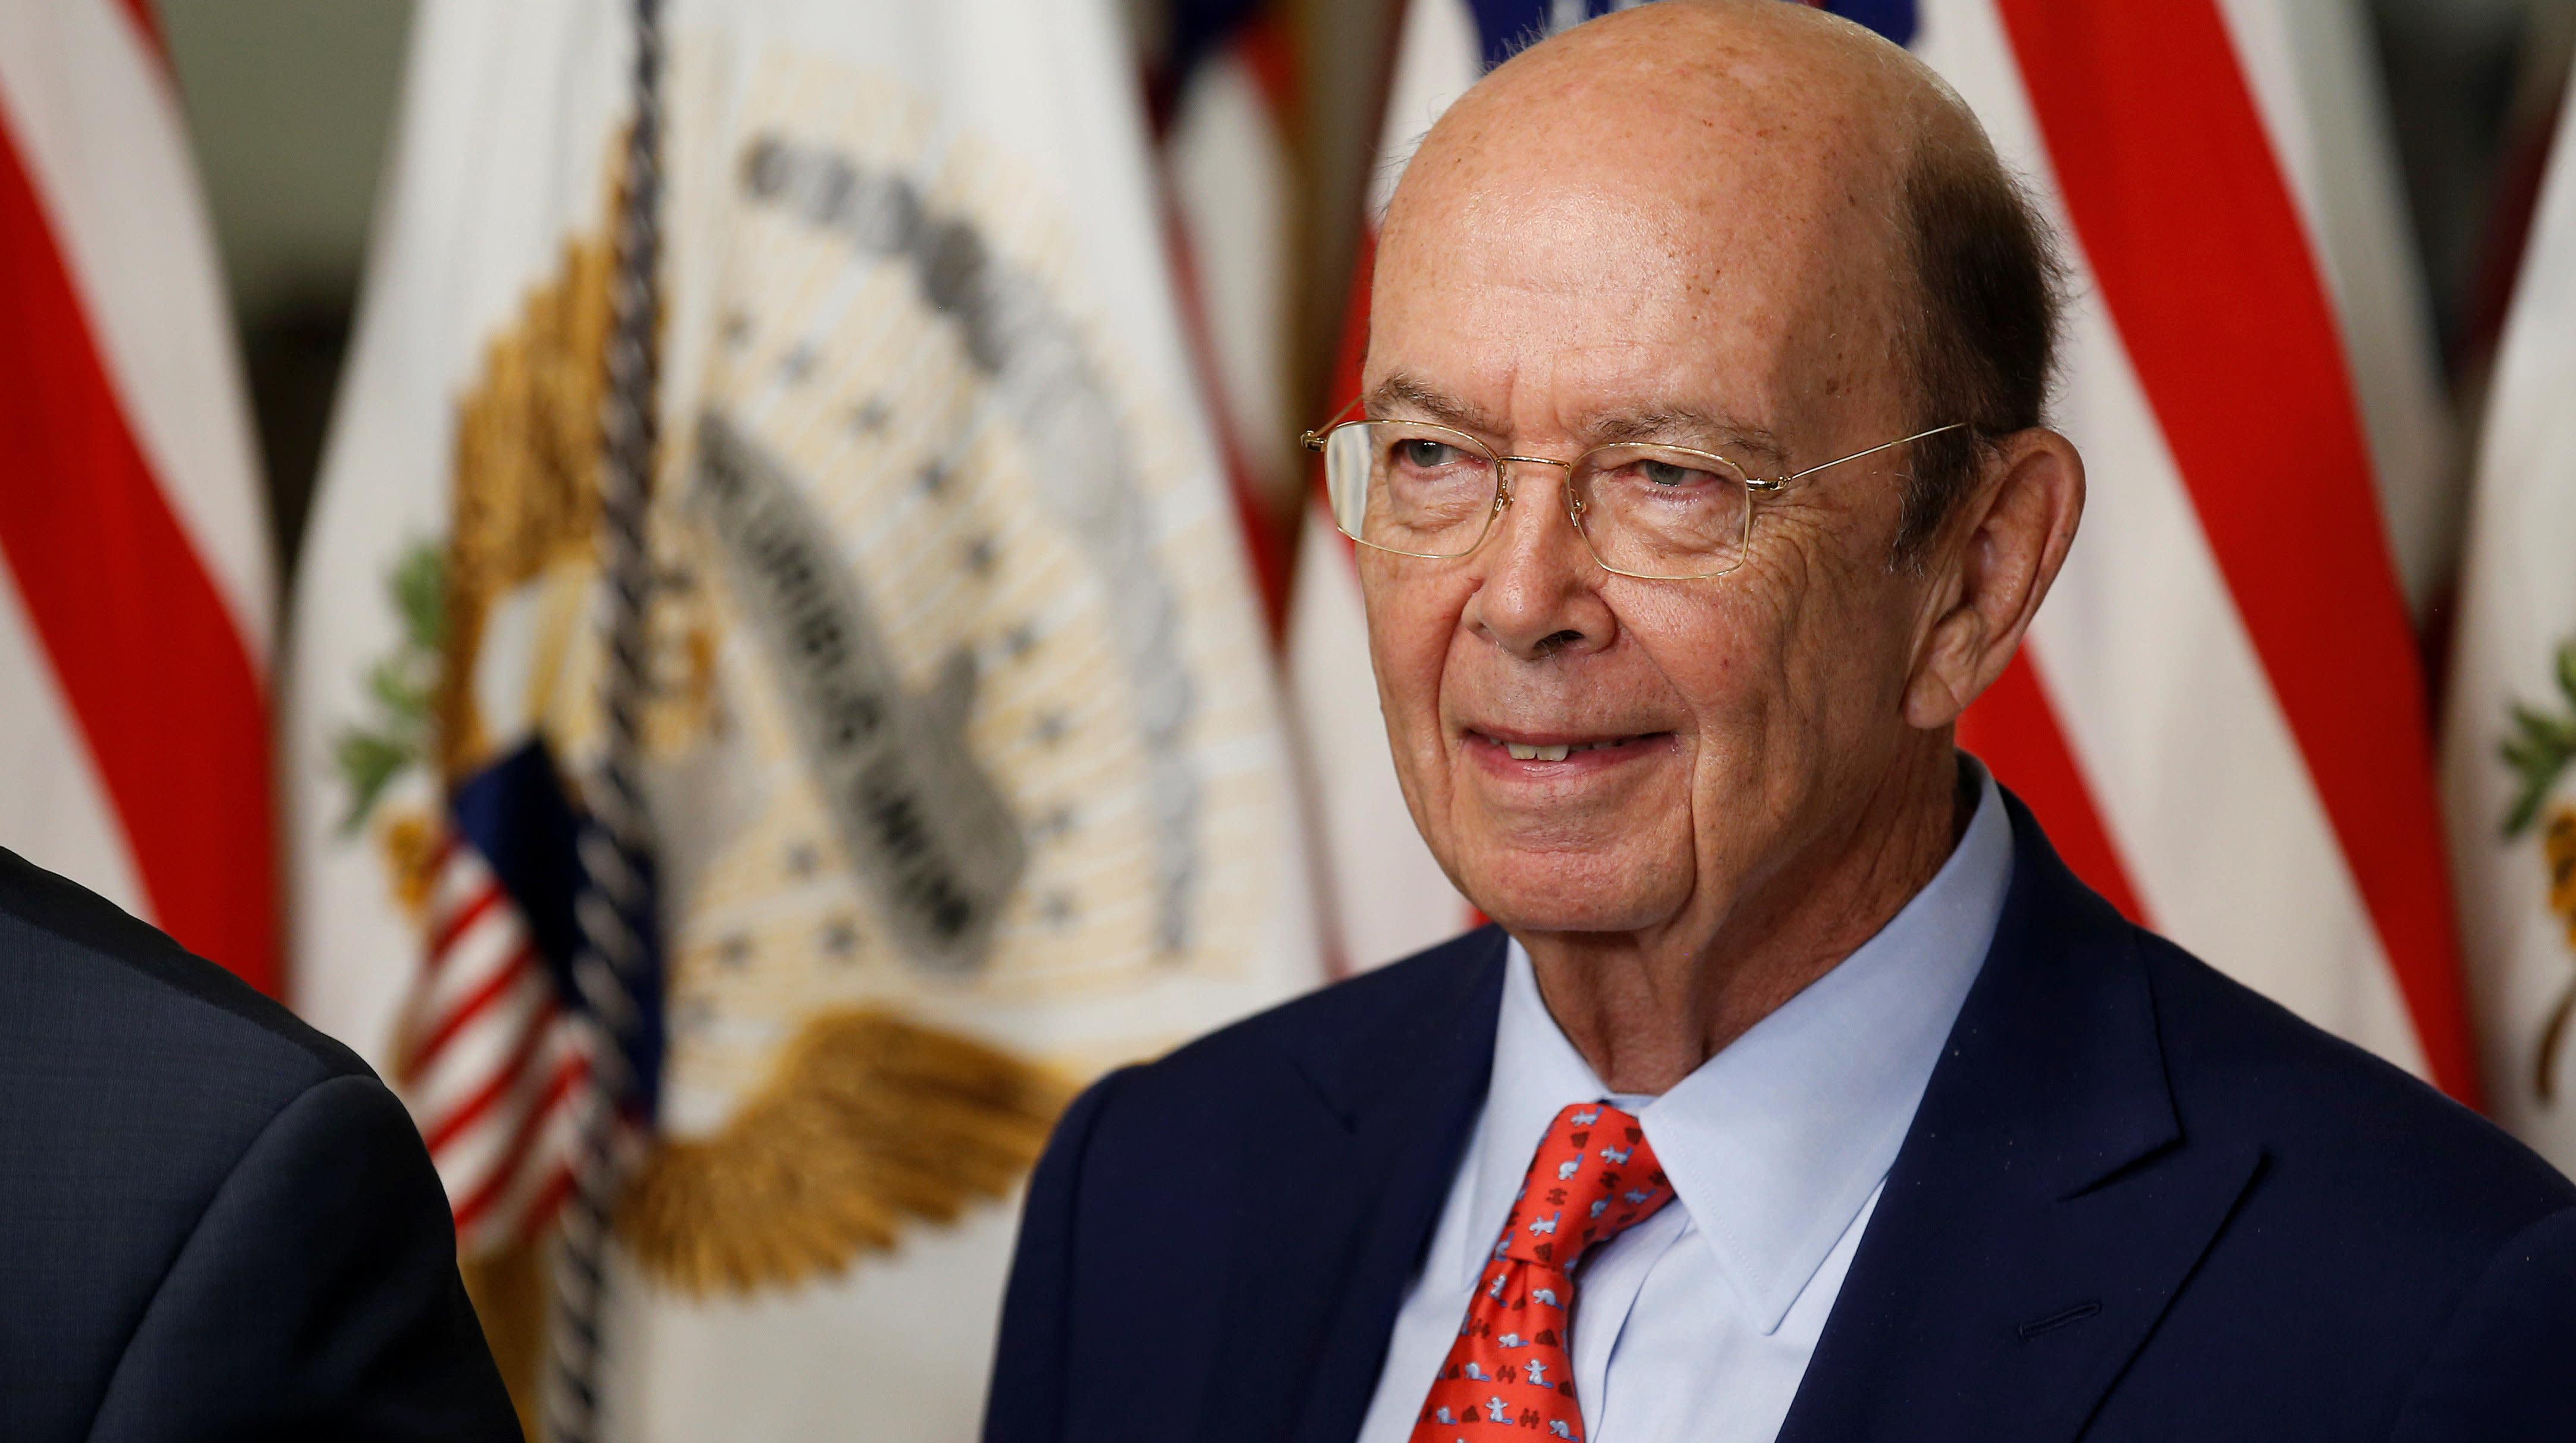 Commerce Secretary Wilbur Ross Failed To Disclose Ties To Vladimir Putin